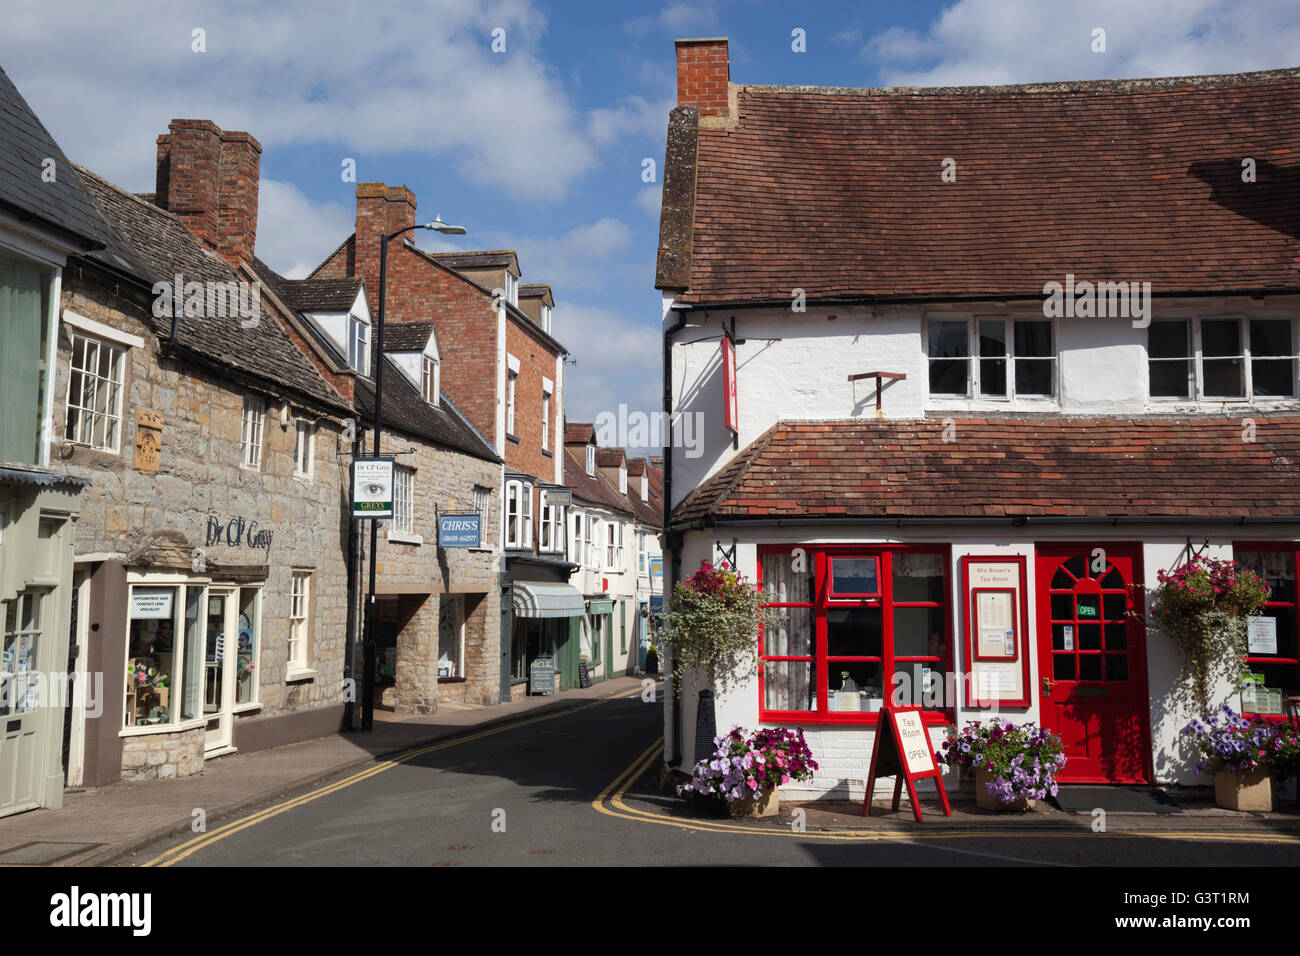 Mrs Brown's Tea Room and view along Sheep Street, Shipston-on-Stour, Warwickshire, England, United Kingdom, - Stock Image